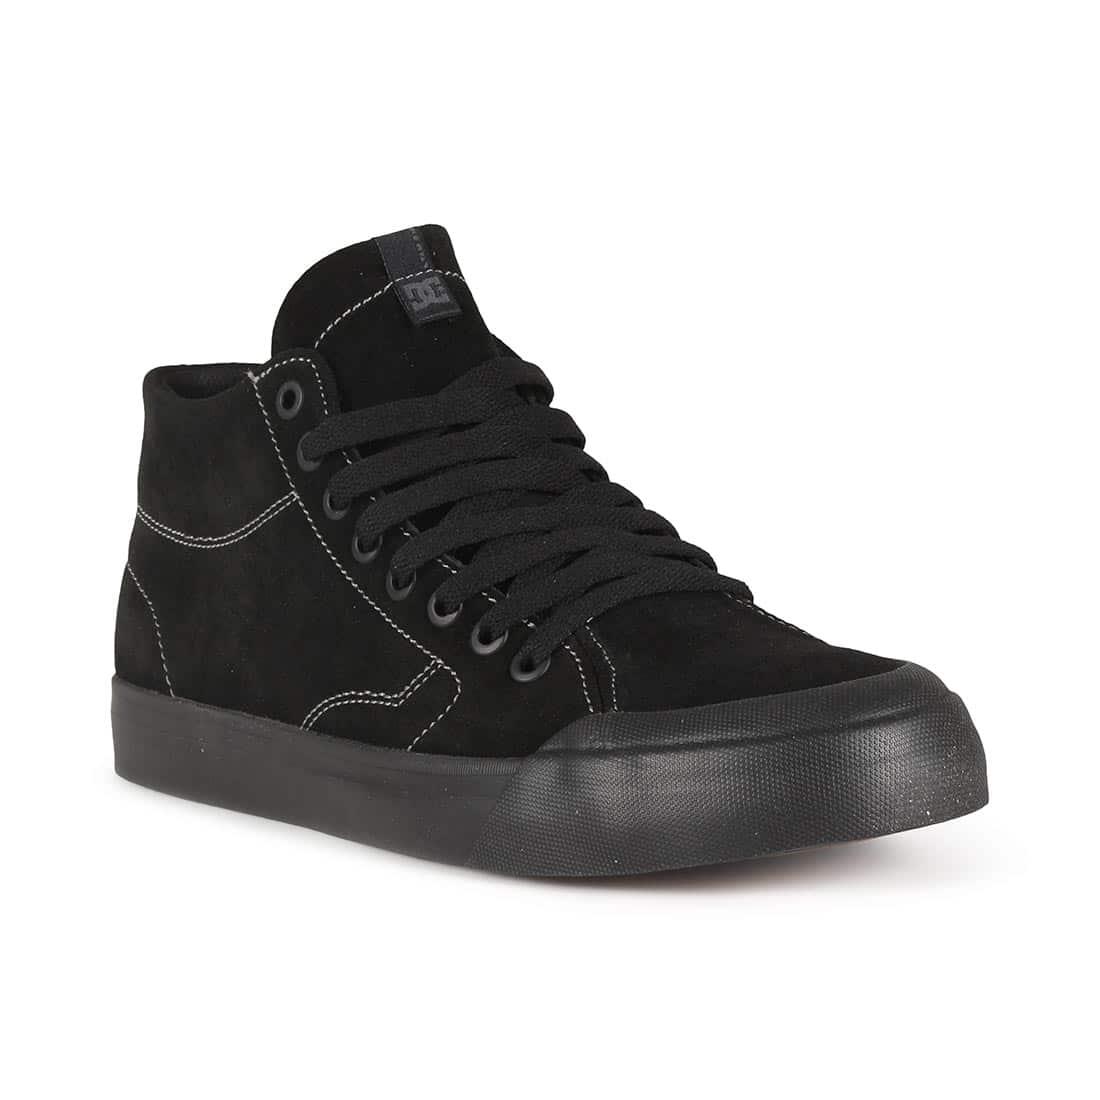 ab6b0a11d3fe DC Shoes Evan Smith Hi Zero S High Top – Black / Black / Black